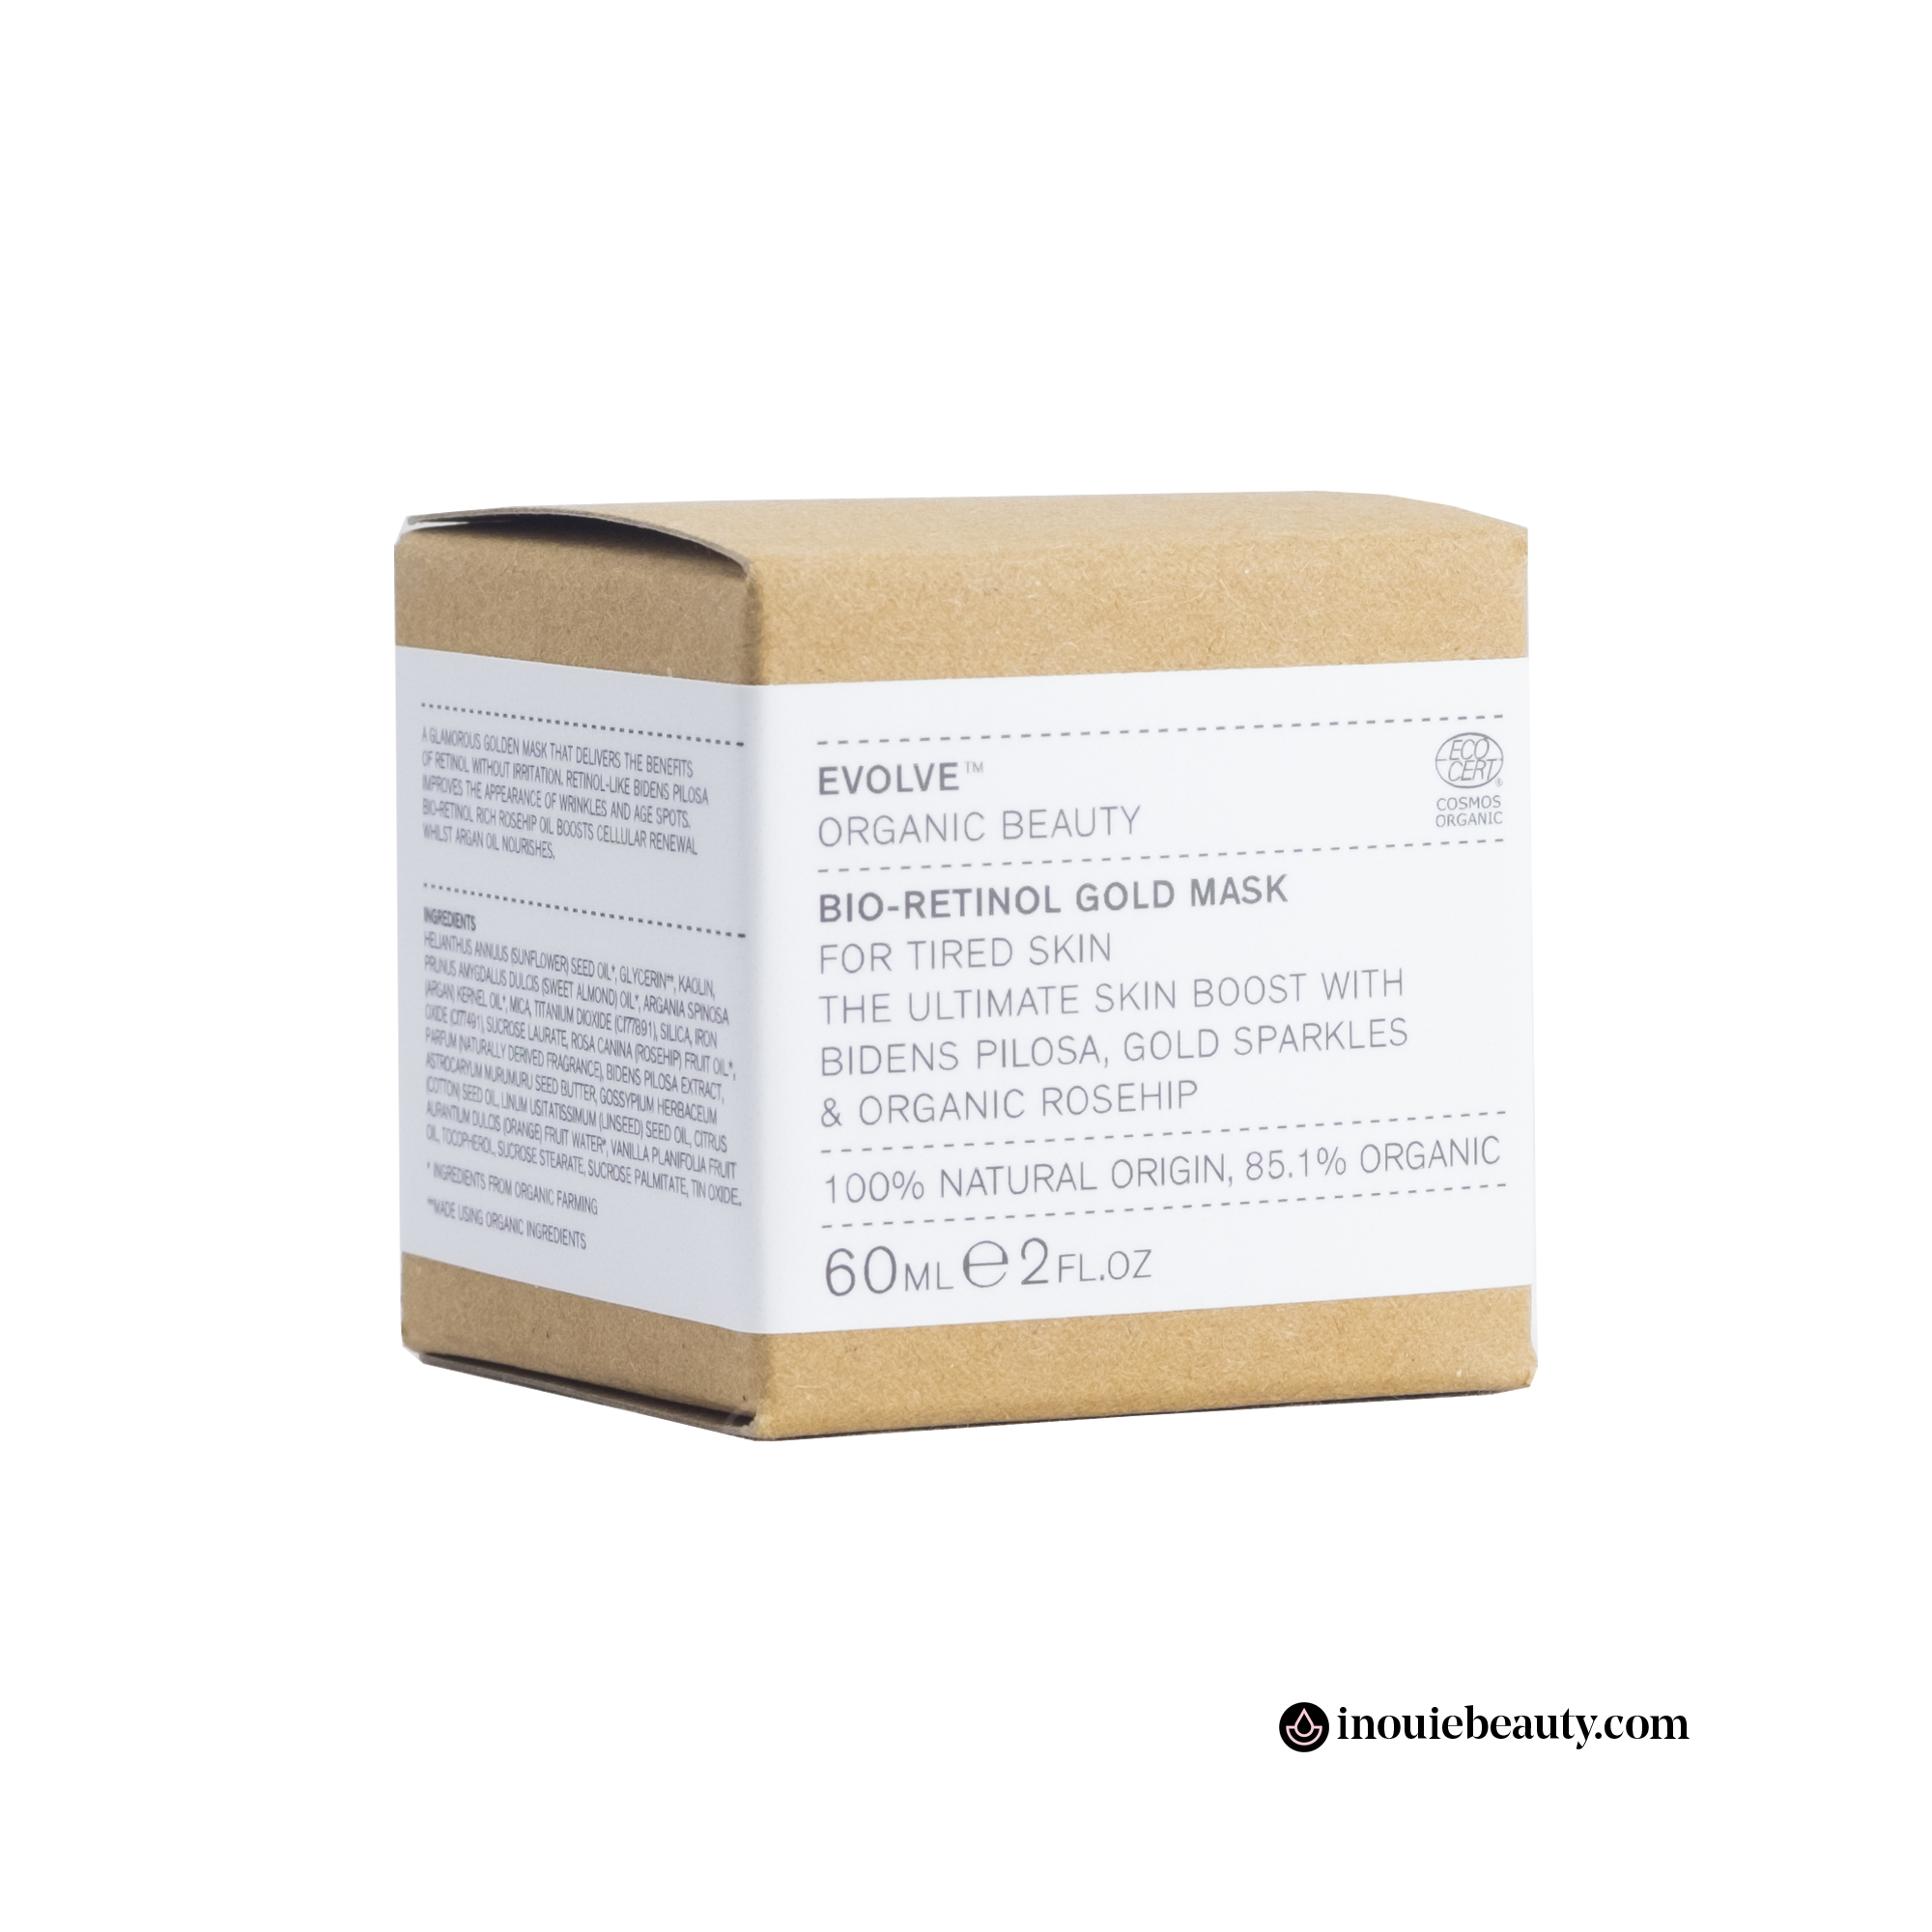 Evolve Bio Retinol Gold Mask